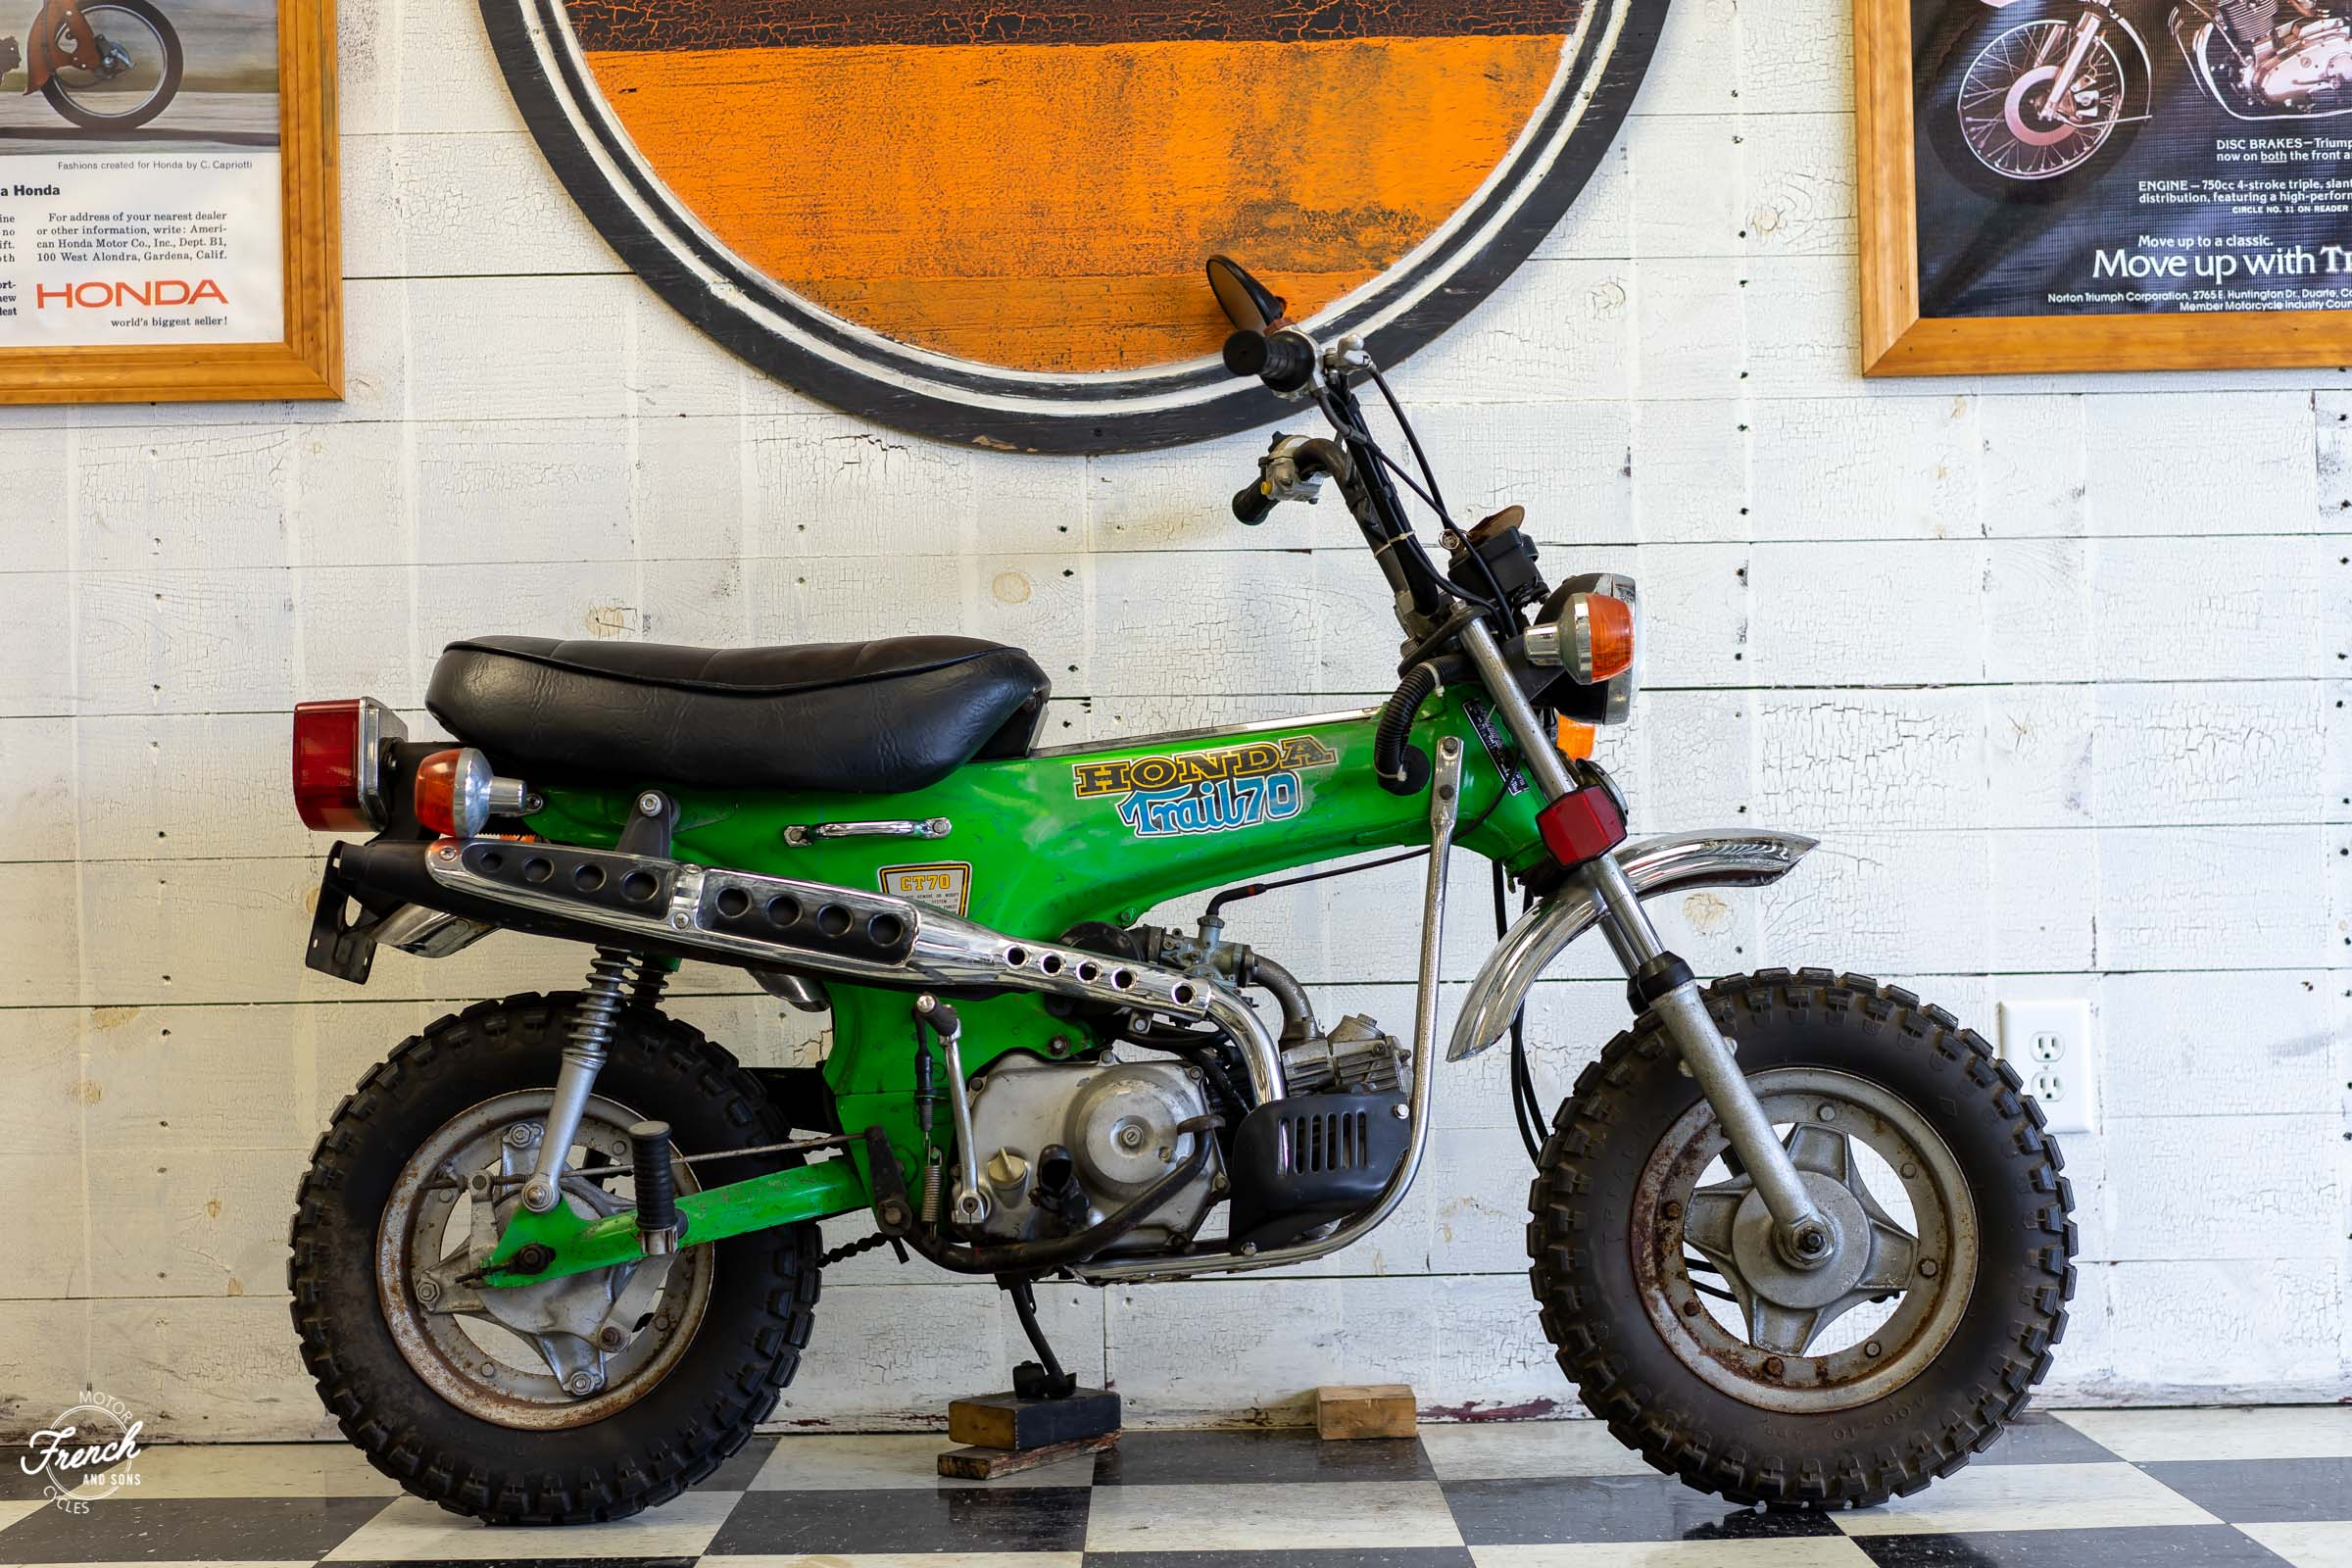 1975hondact70green-2.jpg